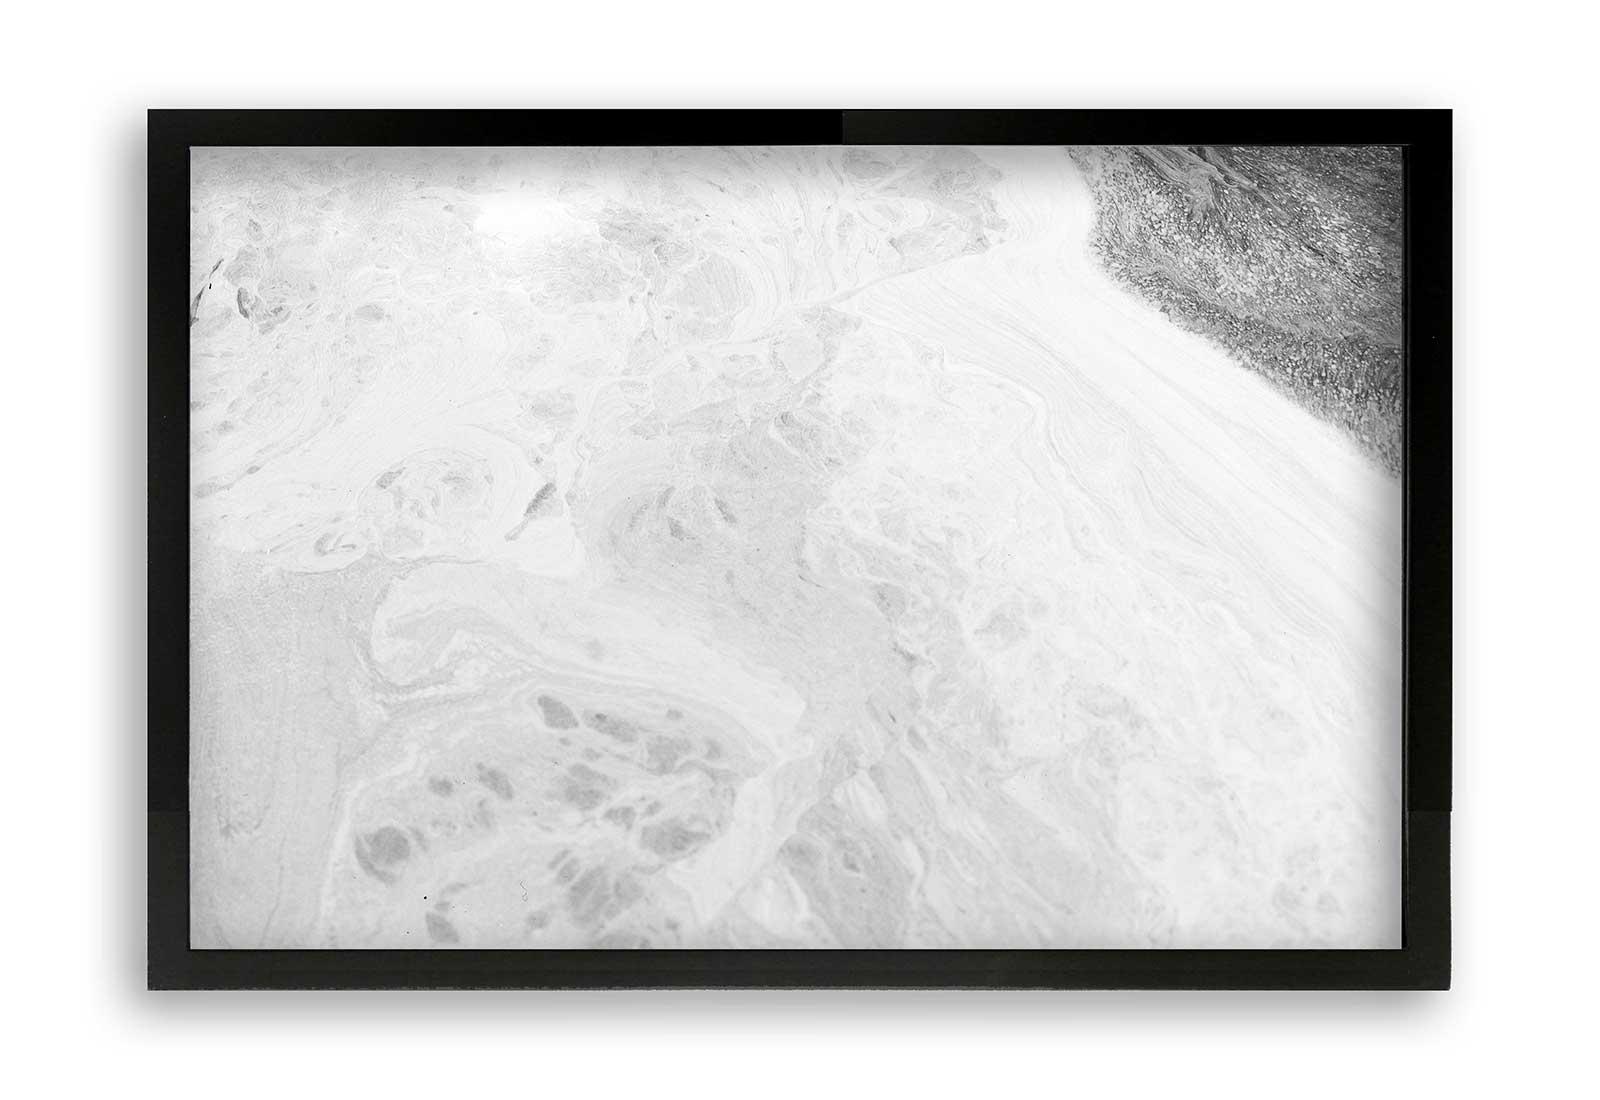 foam-frame-1_2